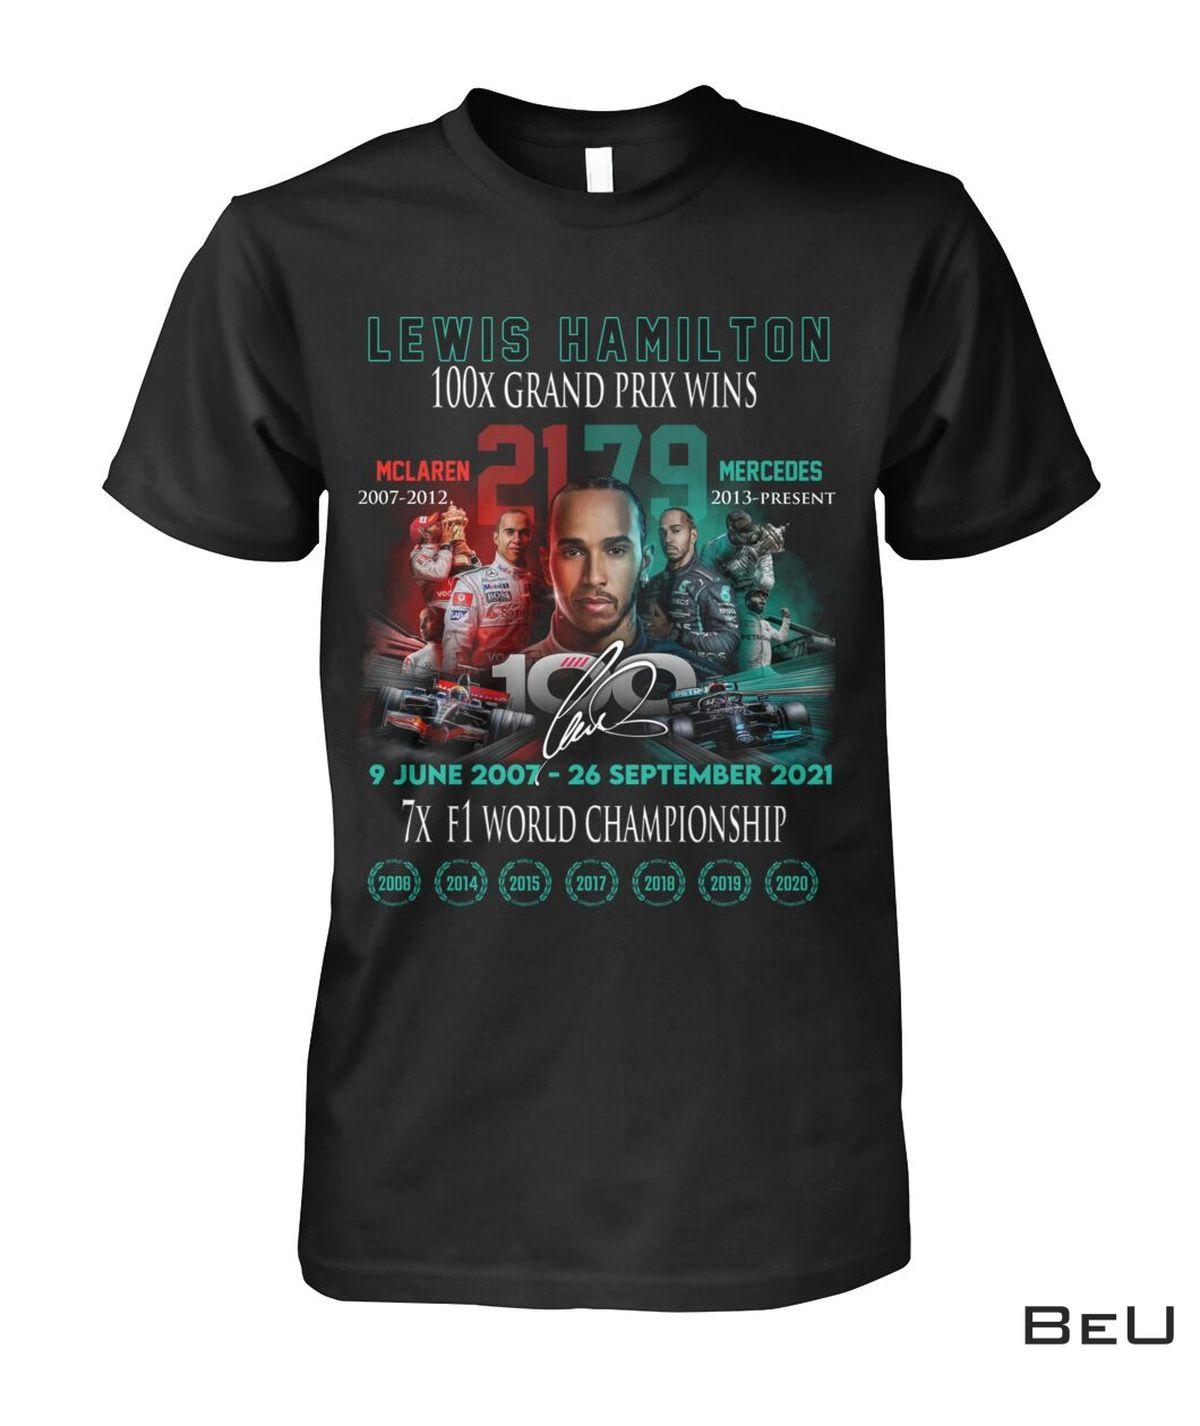 Lewis Hamilton 100x Grand Prix Wins Shirt